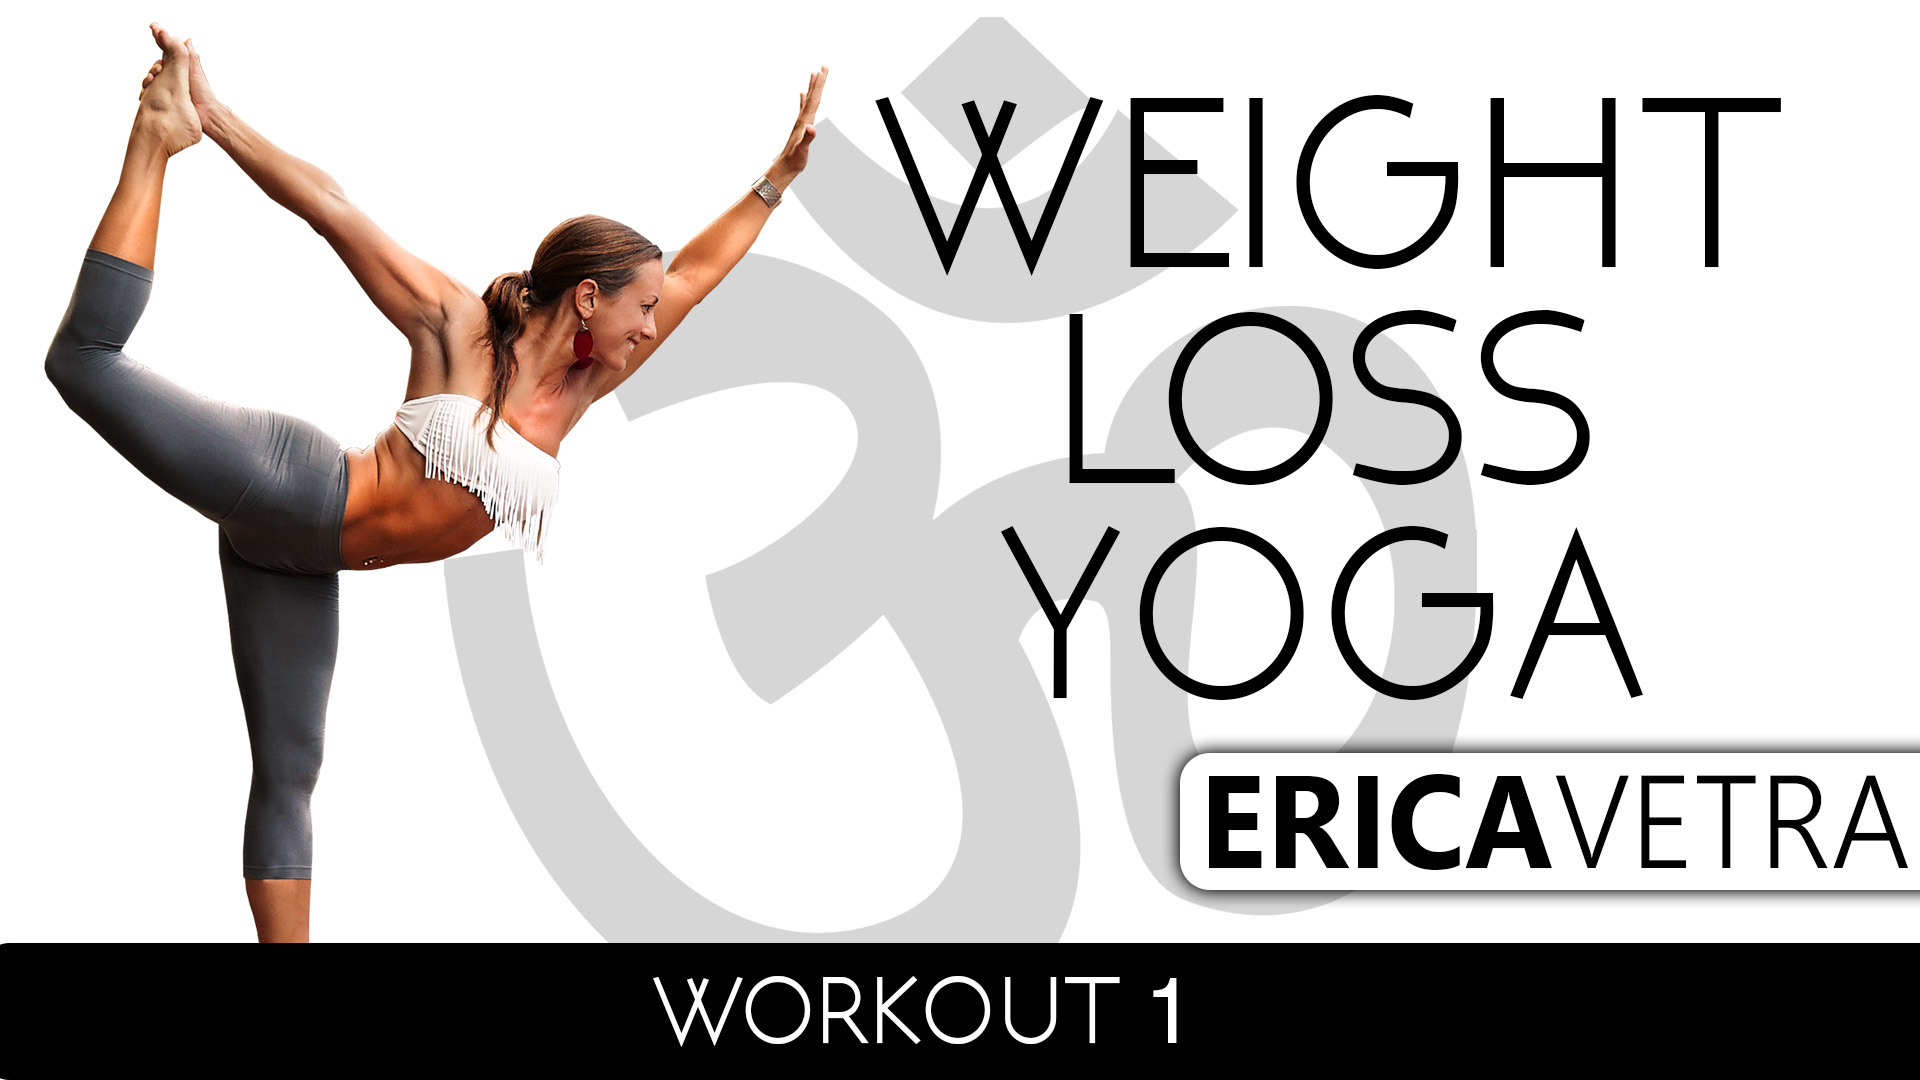 Weight Loss Yoga Workout 1 - Erica Vetra